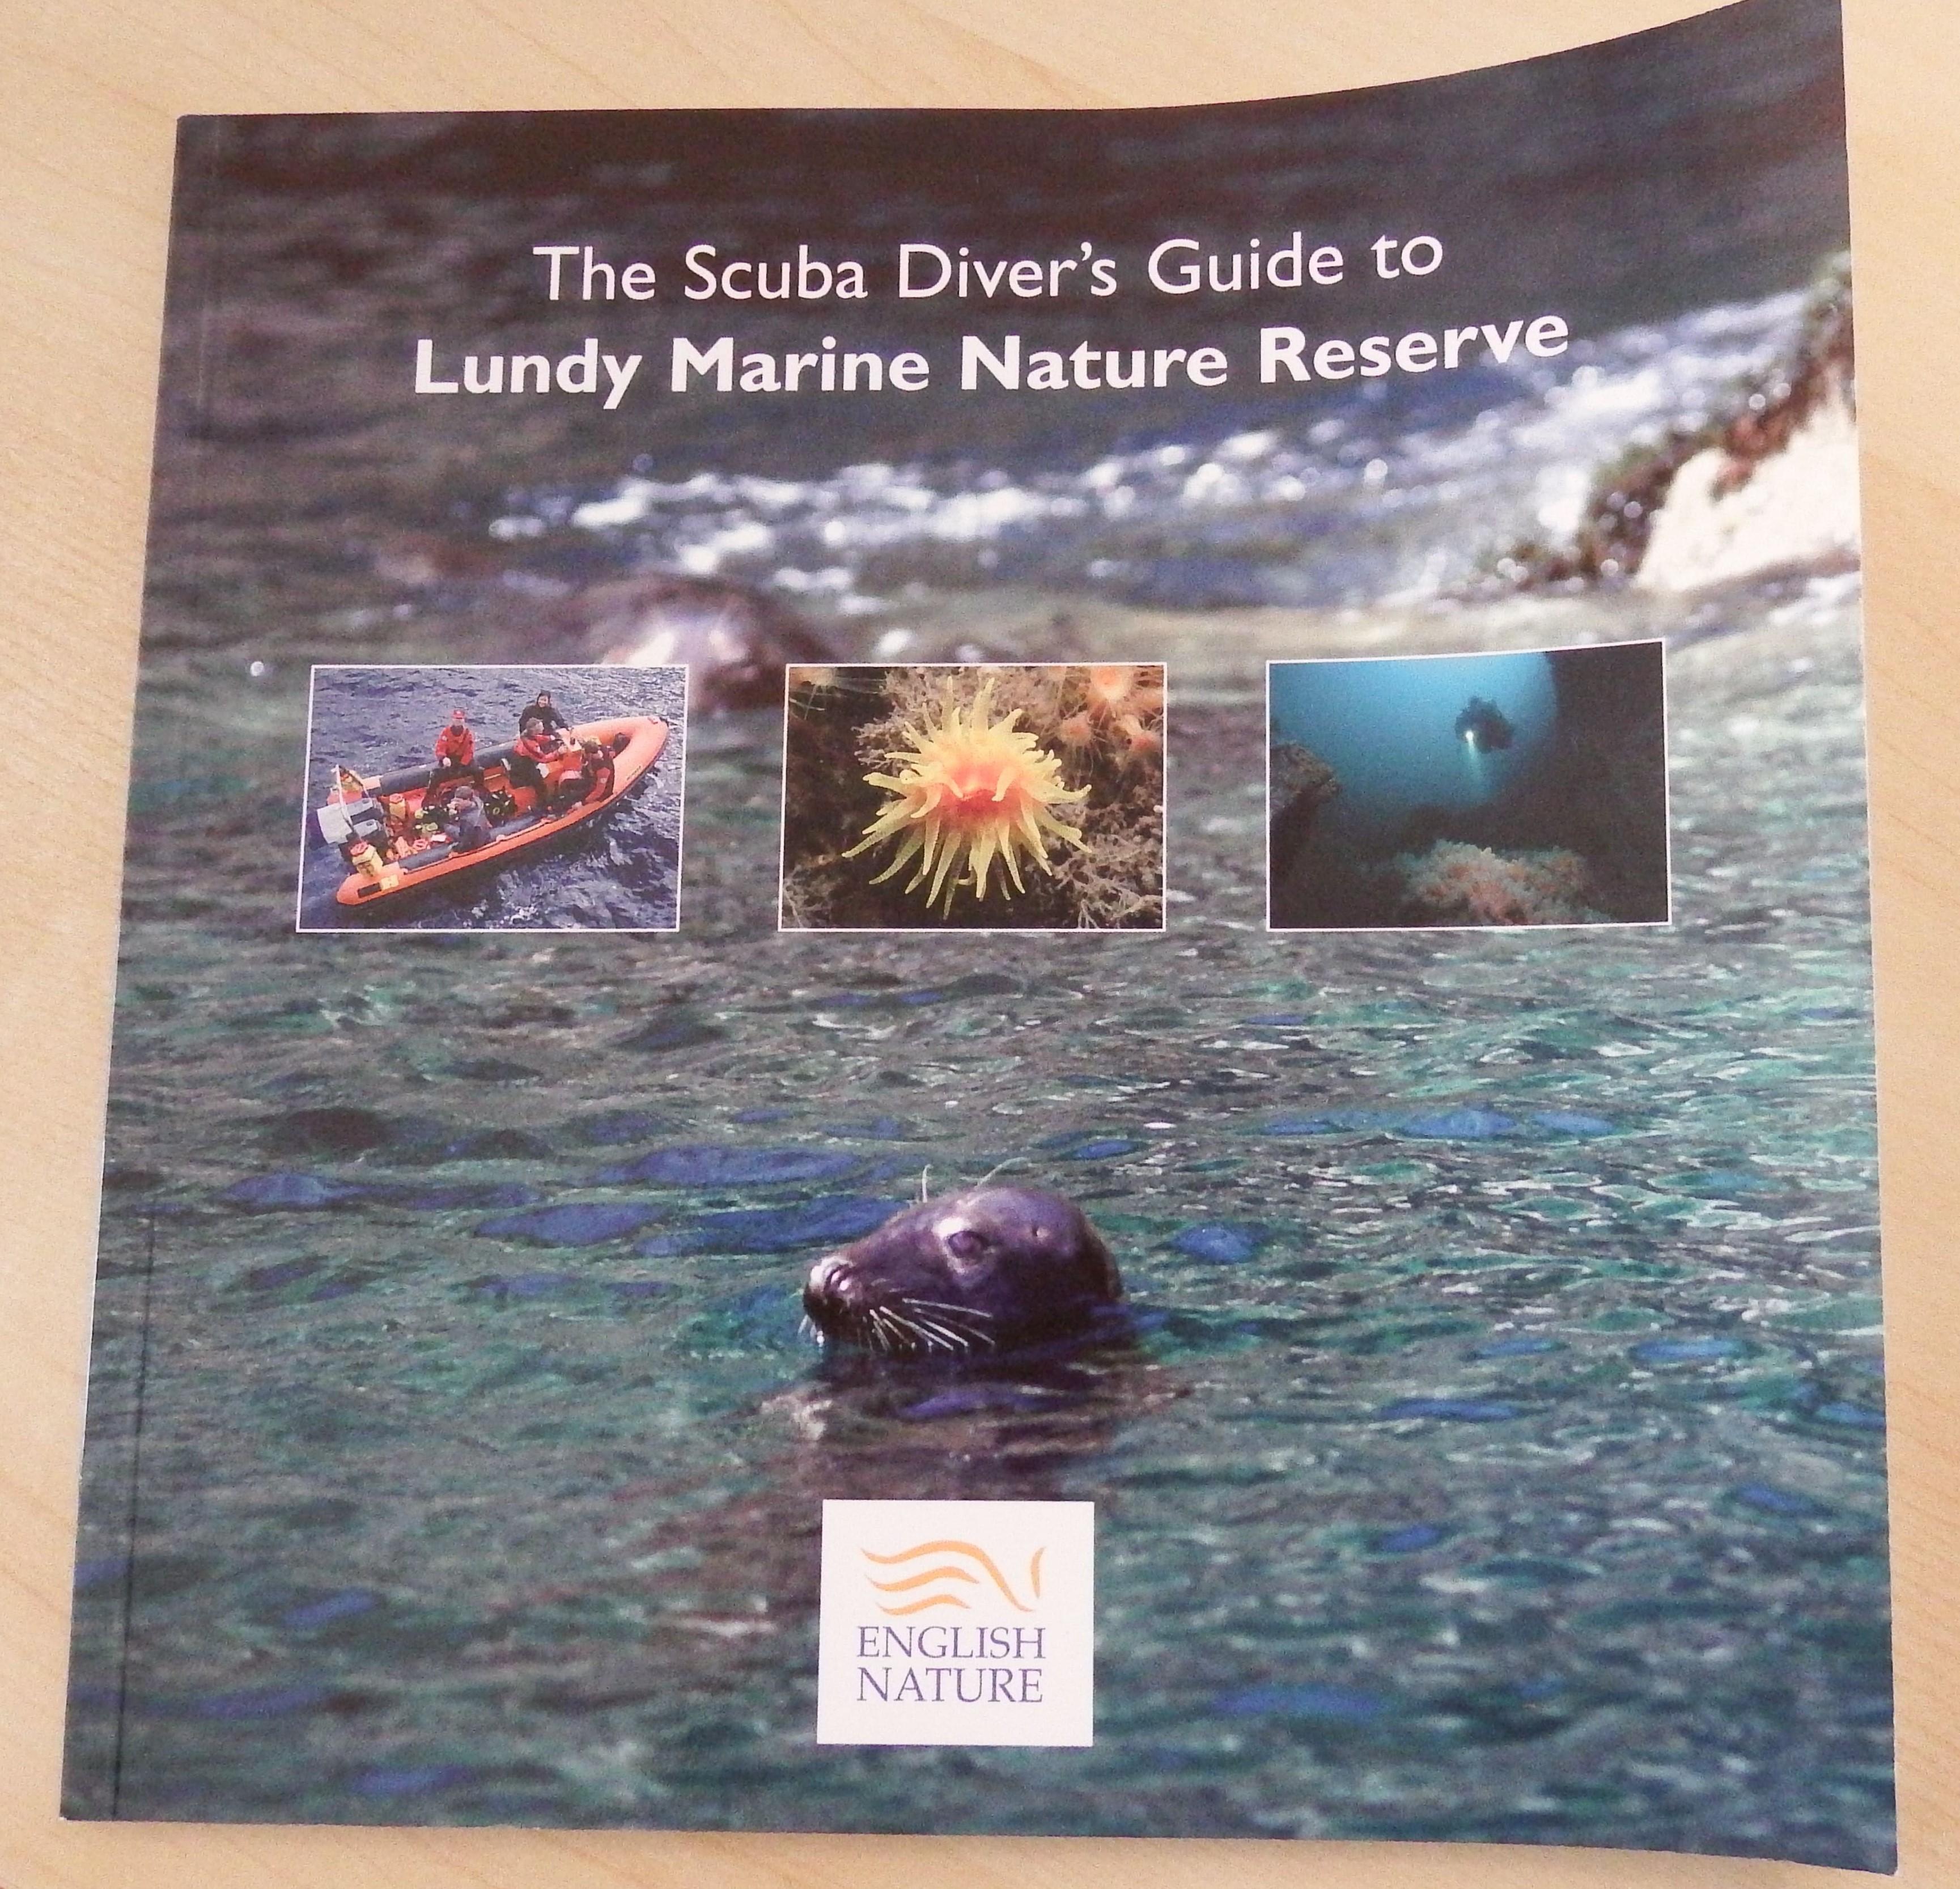 Lundy Marine Nature Reserve